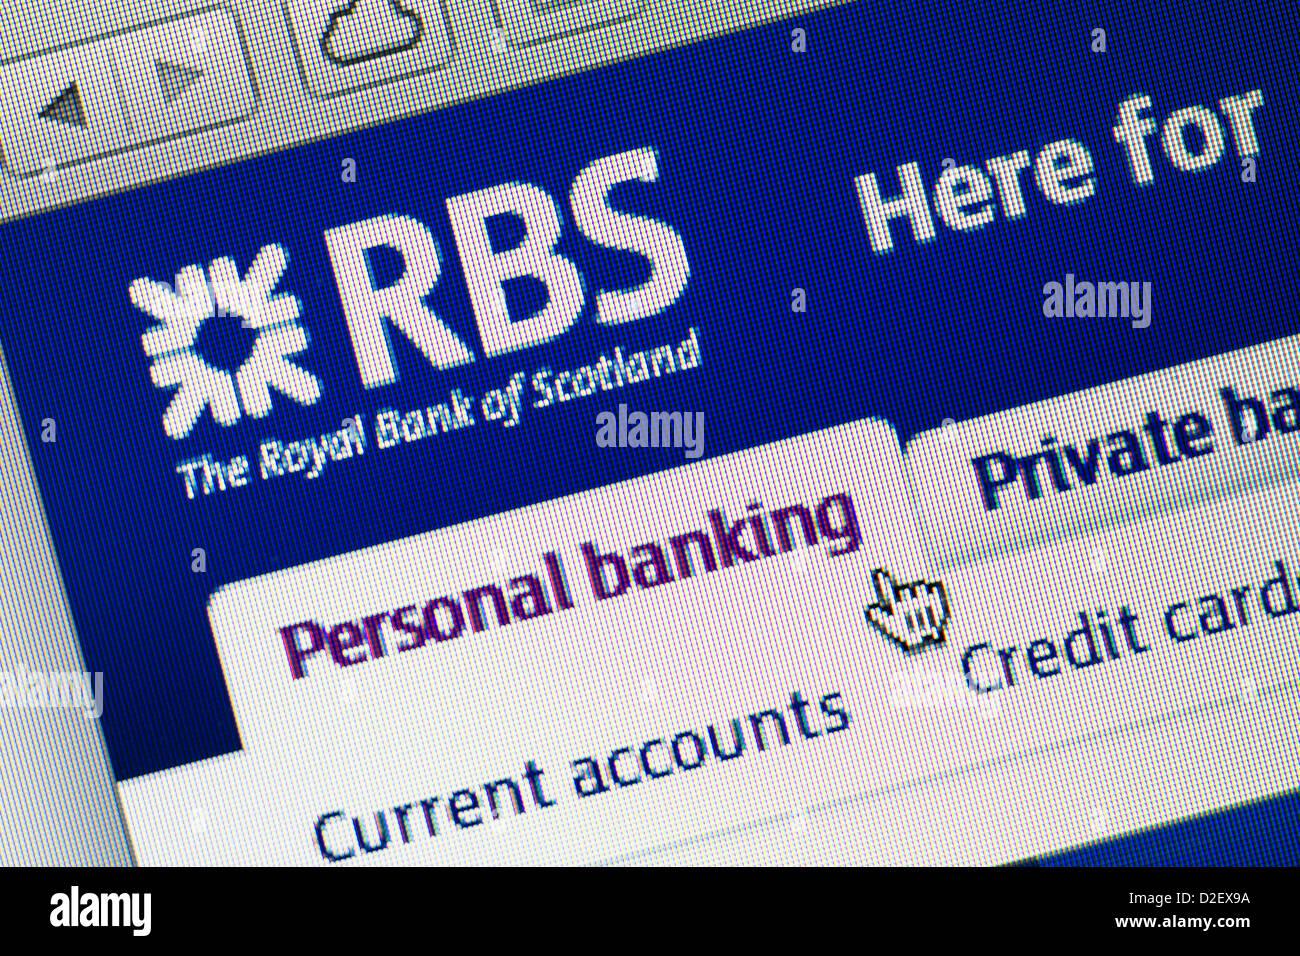 Royal Bank of Scotland, RBS logo and website close up Stock Photo